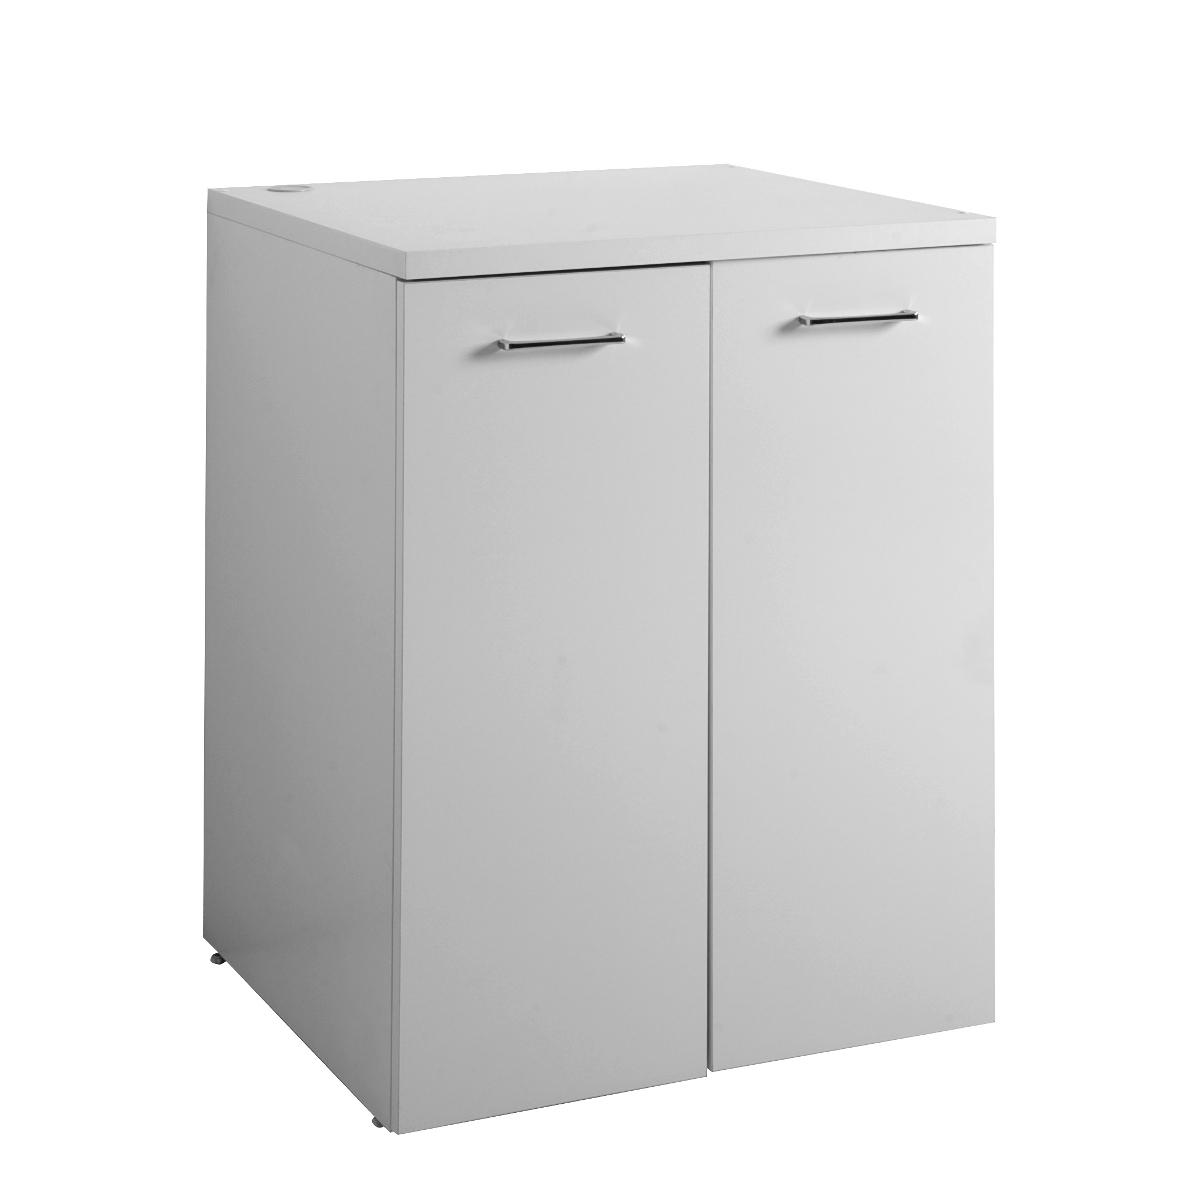 Stunning mobile porta lavatrice photos acrylicgiftware - Mobile lavatrice asciugatrice ikea ...